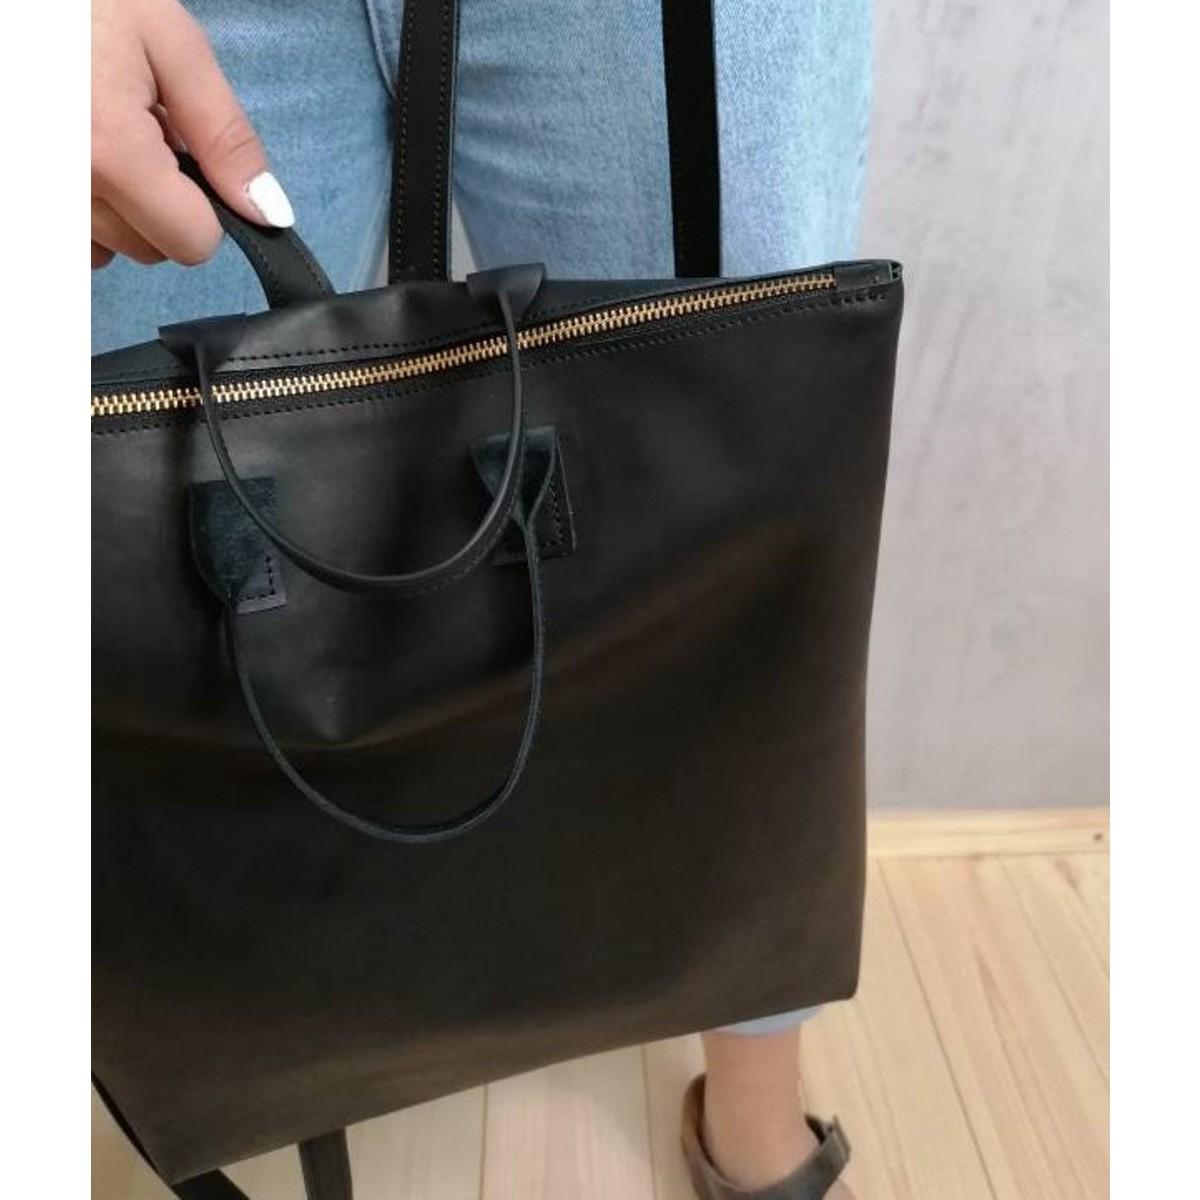 Minimalistischer Lederrucksack // Damen Rucksack // schwarzer Lederrucksack // black leather backpack // minimal